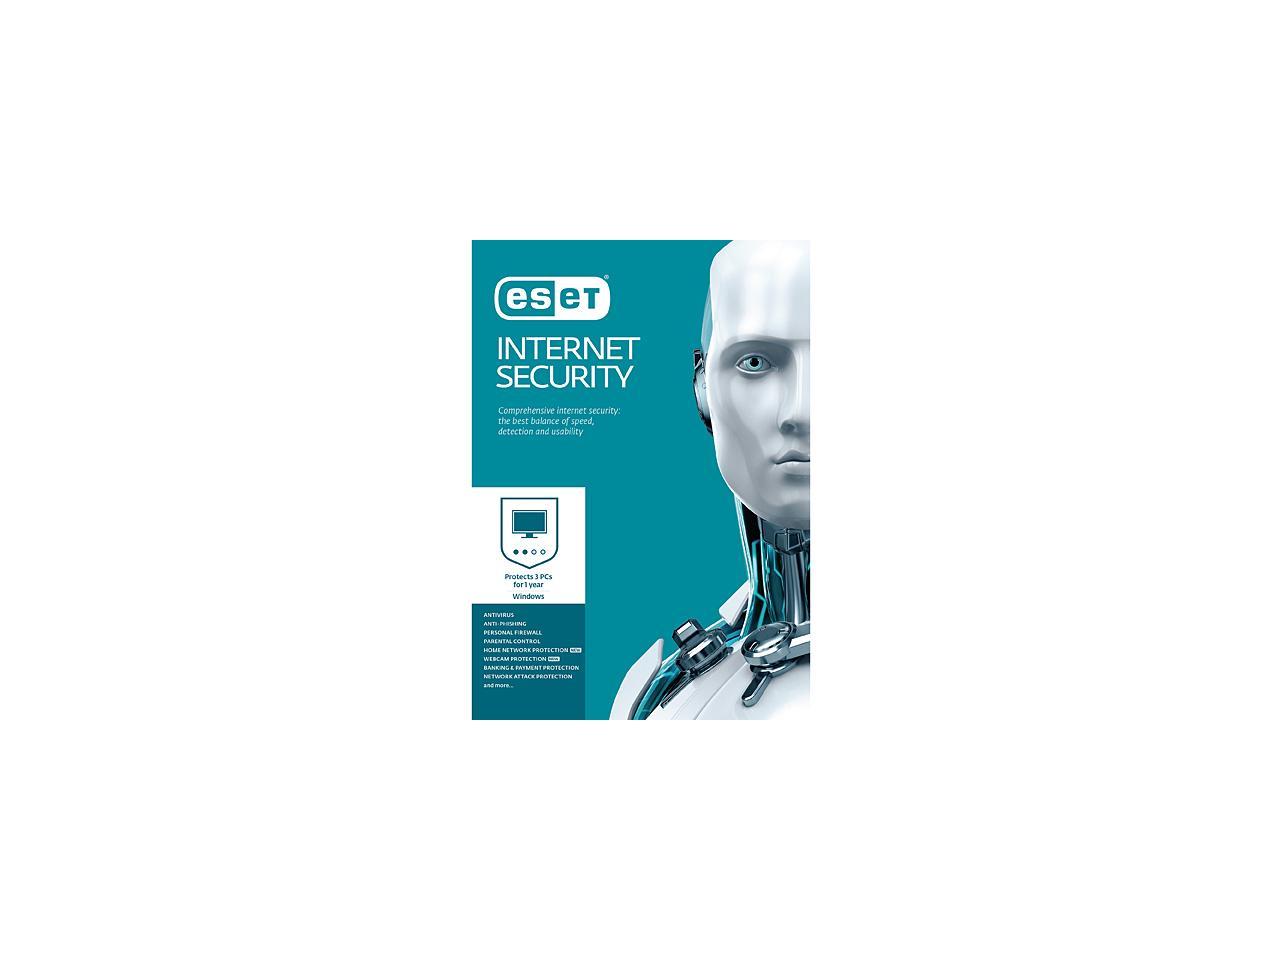 ESET Internet Security 2017 - 3 PCs (Free upgrade to 2018) $19.99